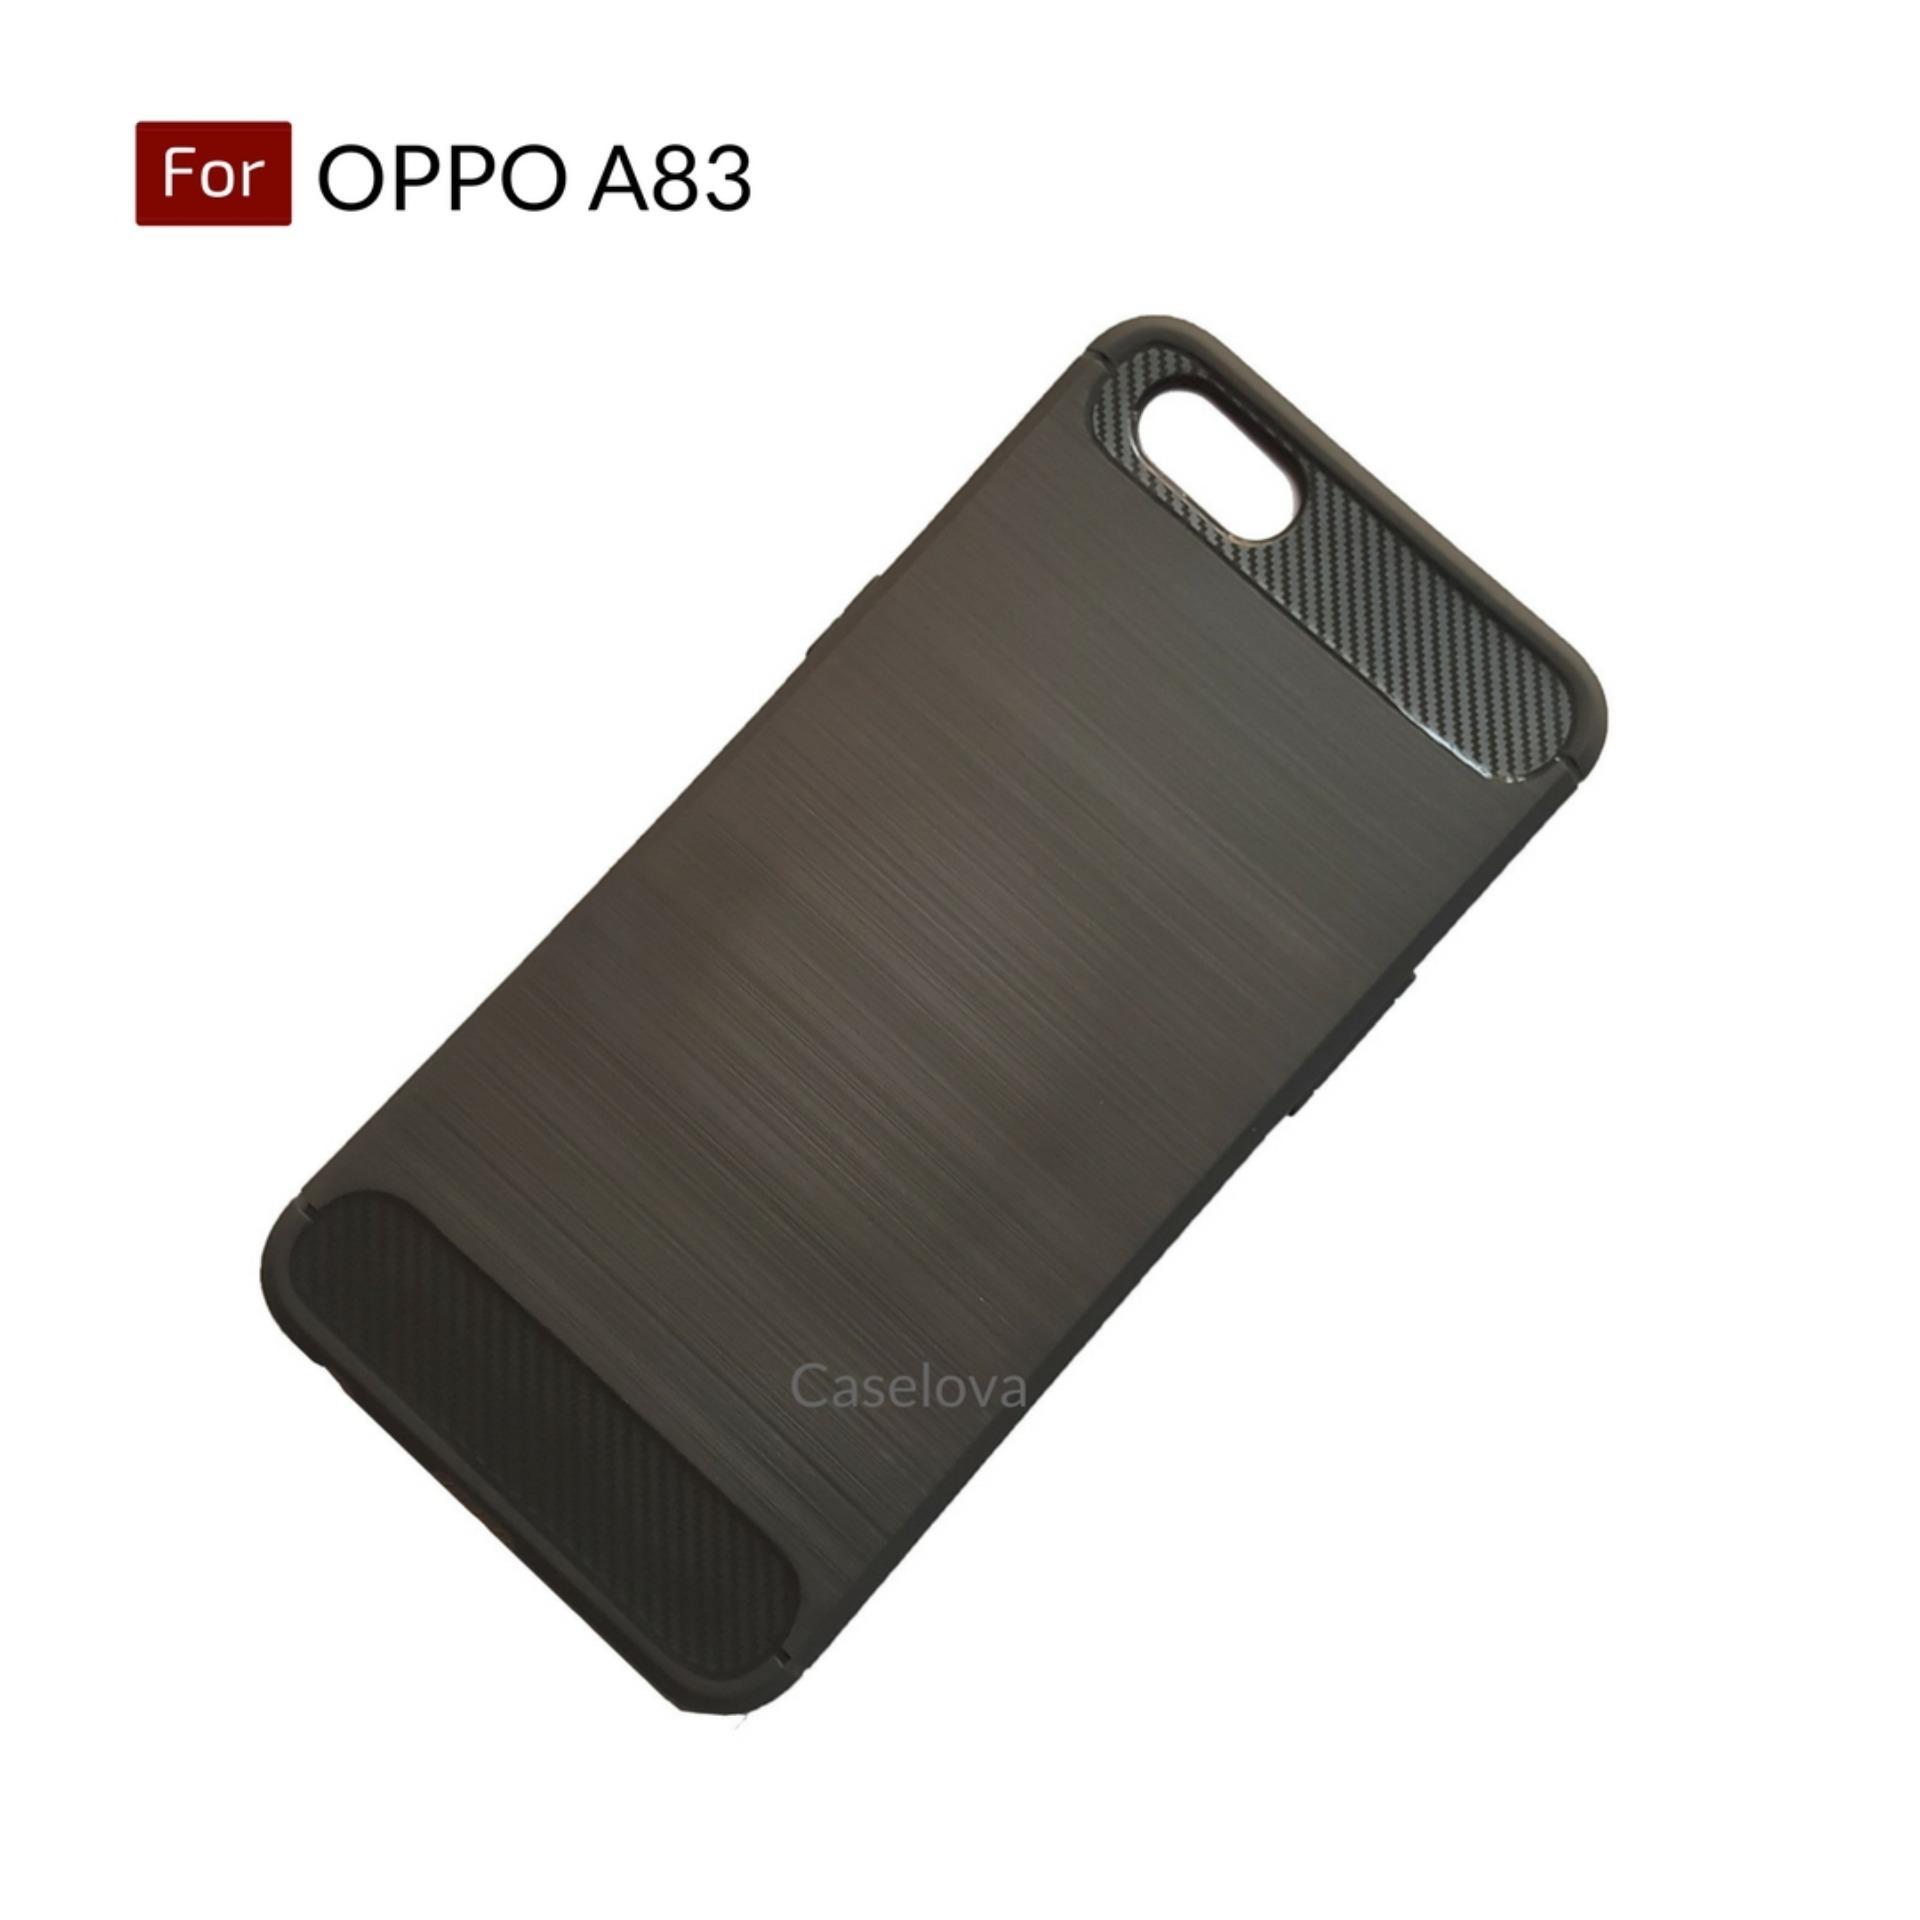 Caselova Premium Quality Carbon Shockproof Hybrid Case for OPPO A83 + Gratis Tempered Glass Bening ...